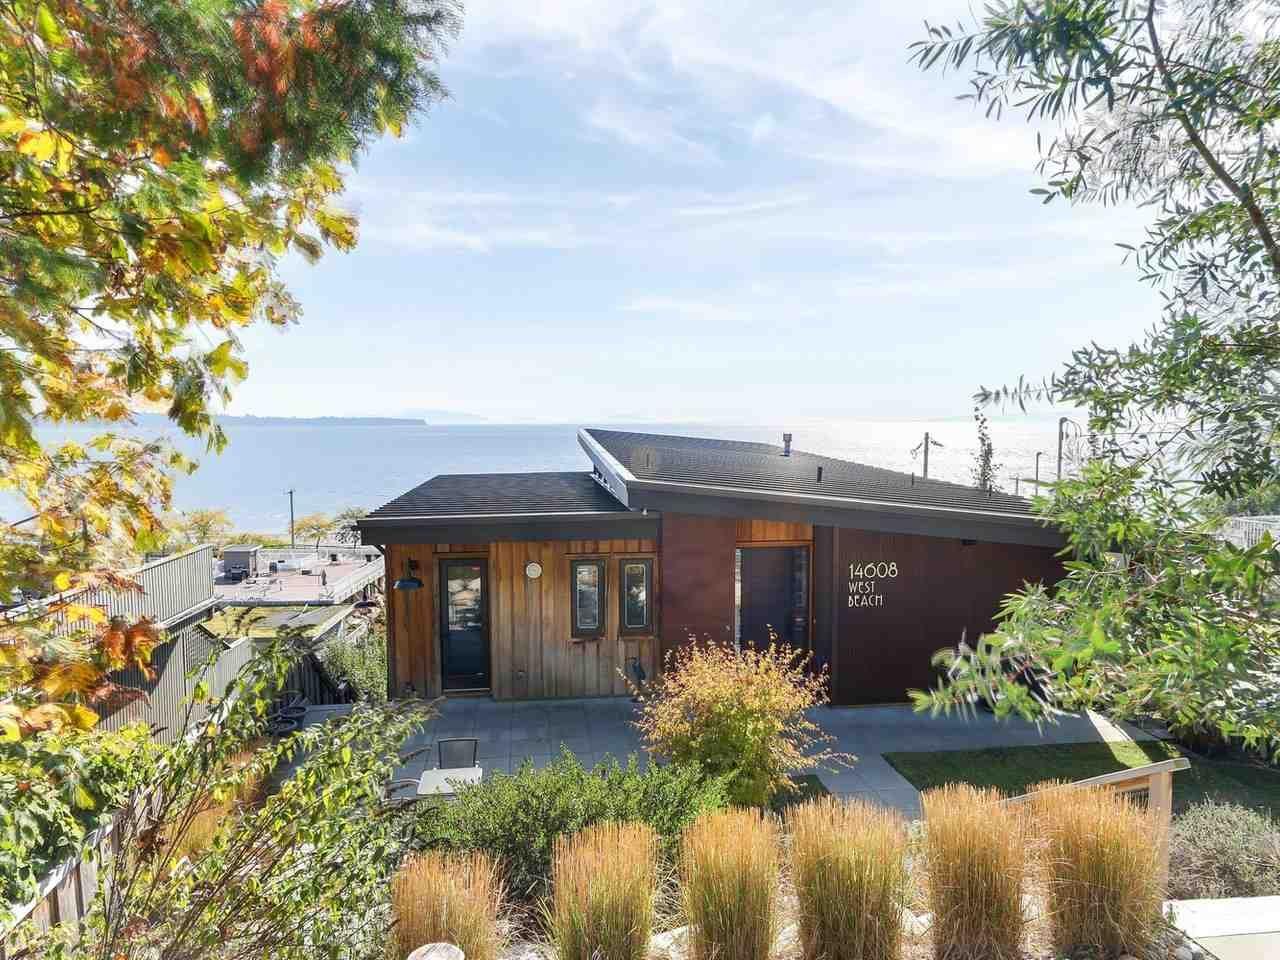 Main Photo: 14608 WEST BEACH Avenue: White Rock House for sale (South Surrey White Rock)  : MLS®# R2535601